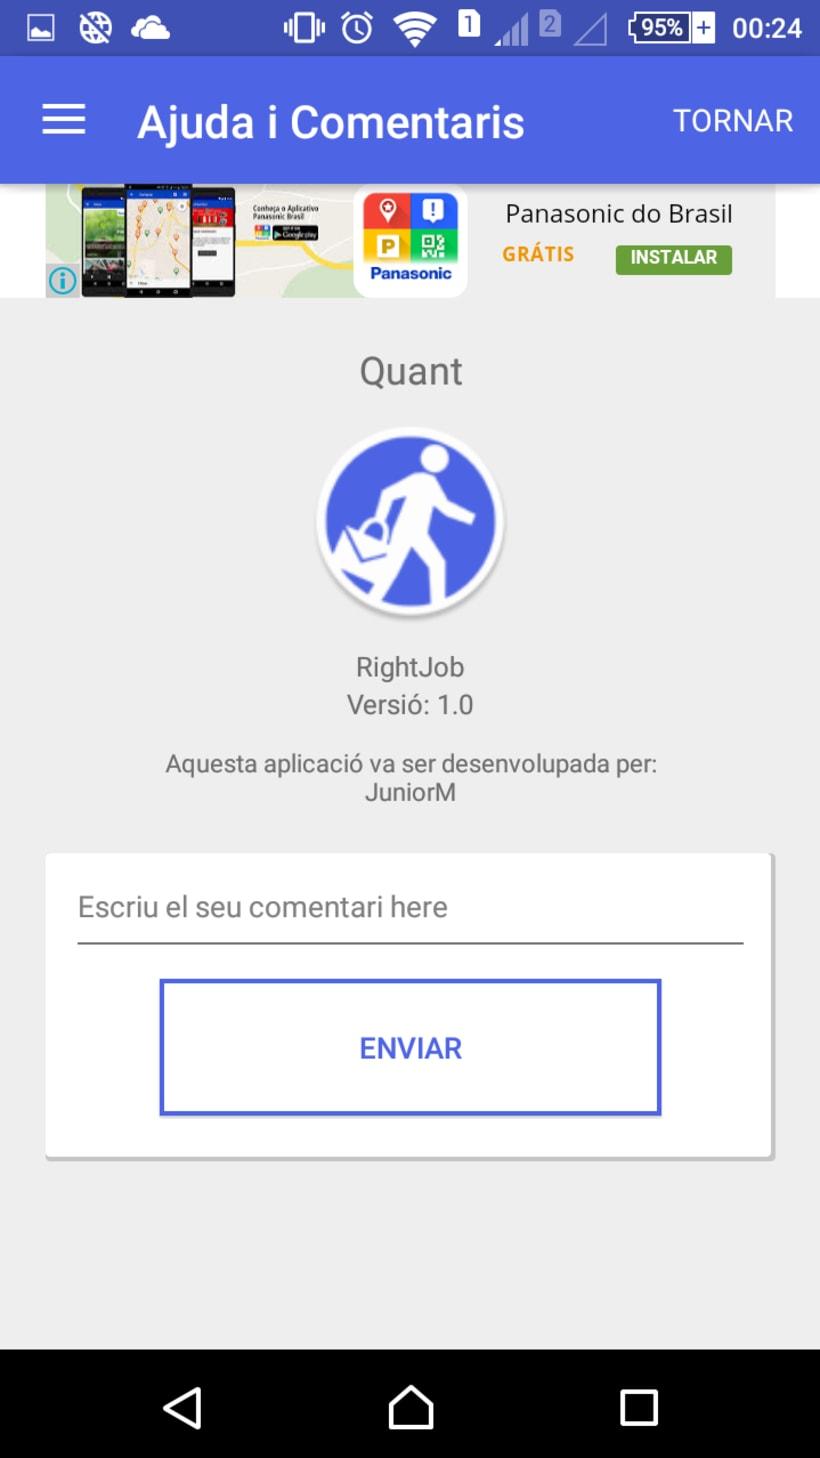 RightJob, Android APP 0